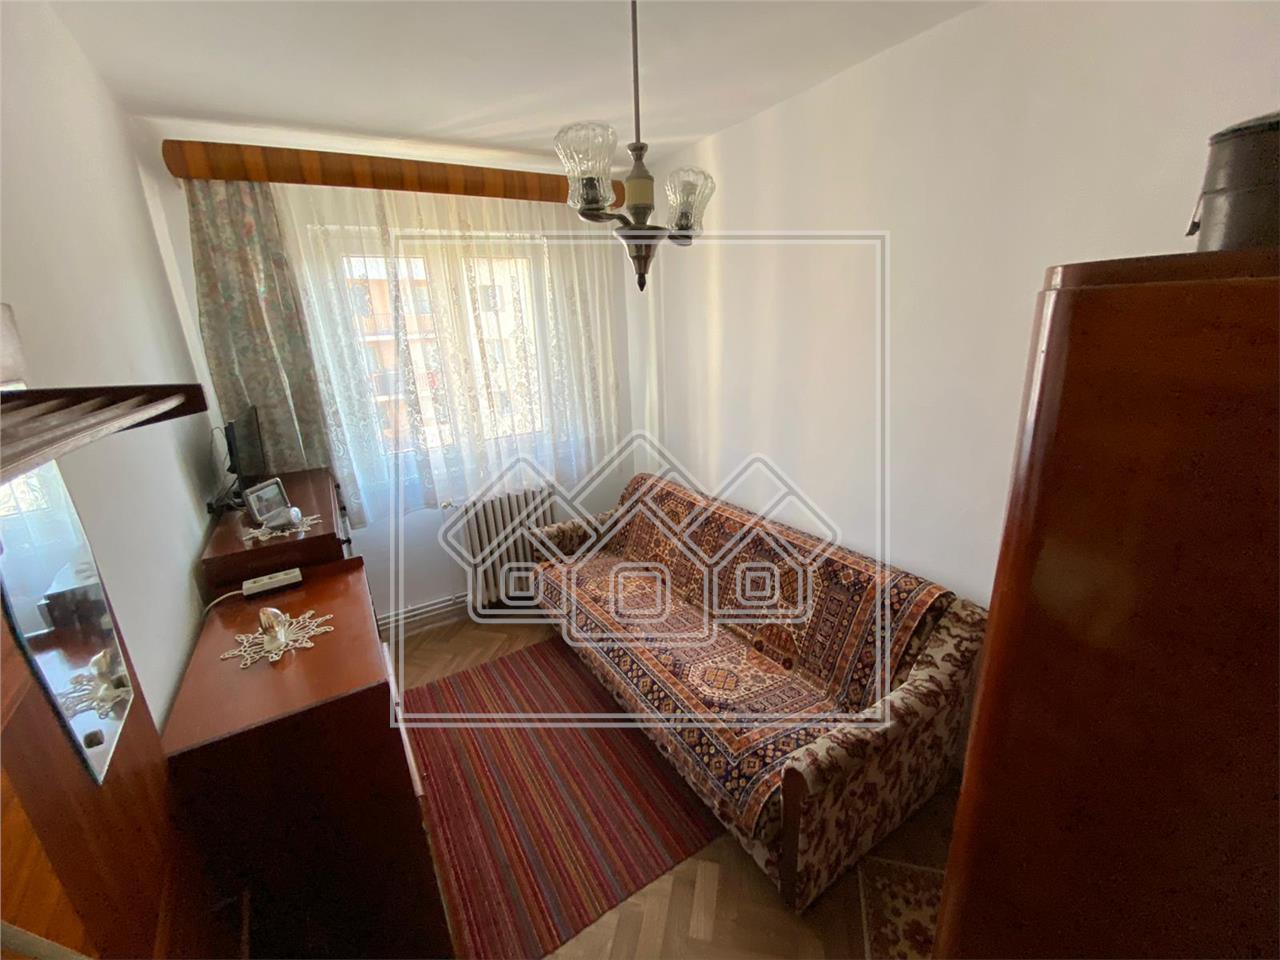 Apartament de vanzare in Sibiu, 3 camere, zona Rahovei